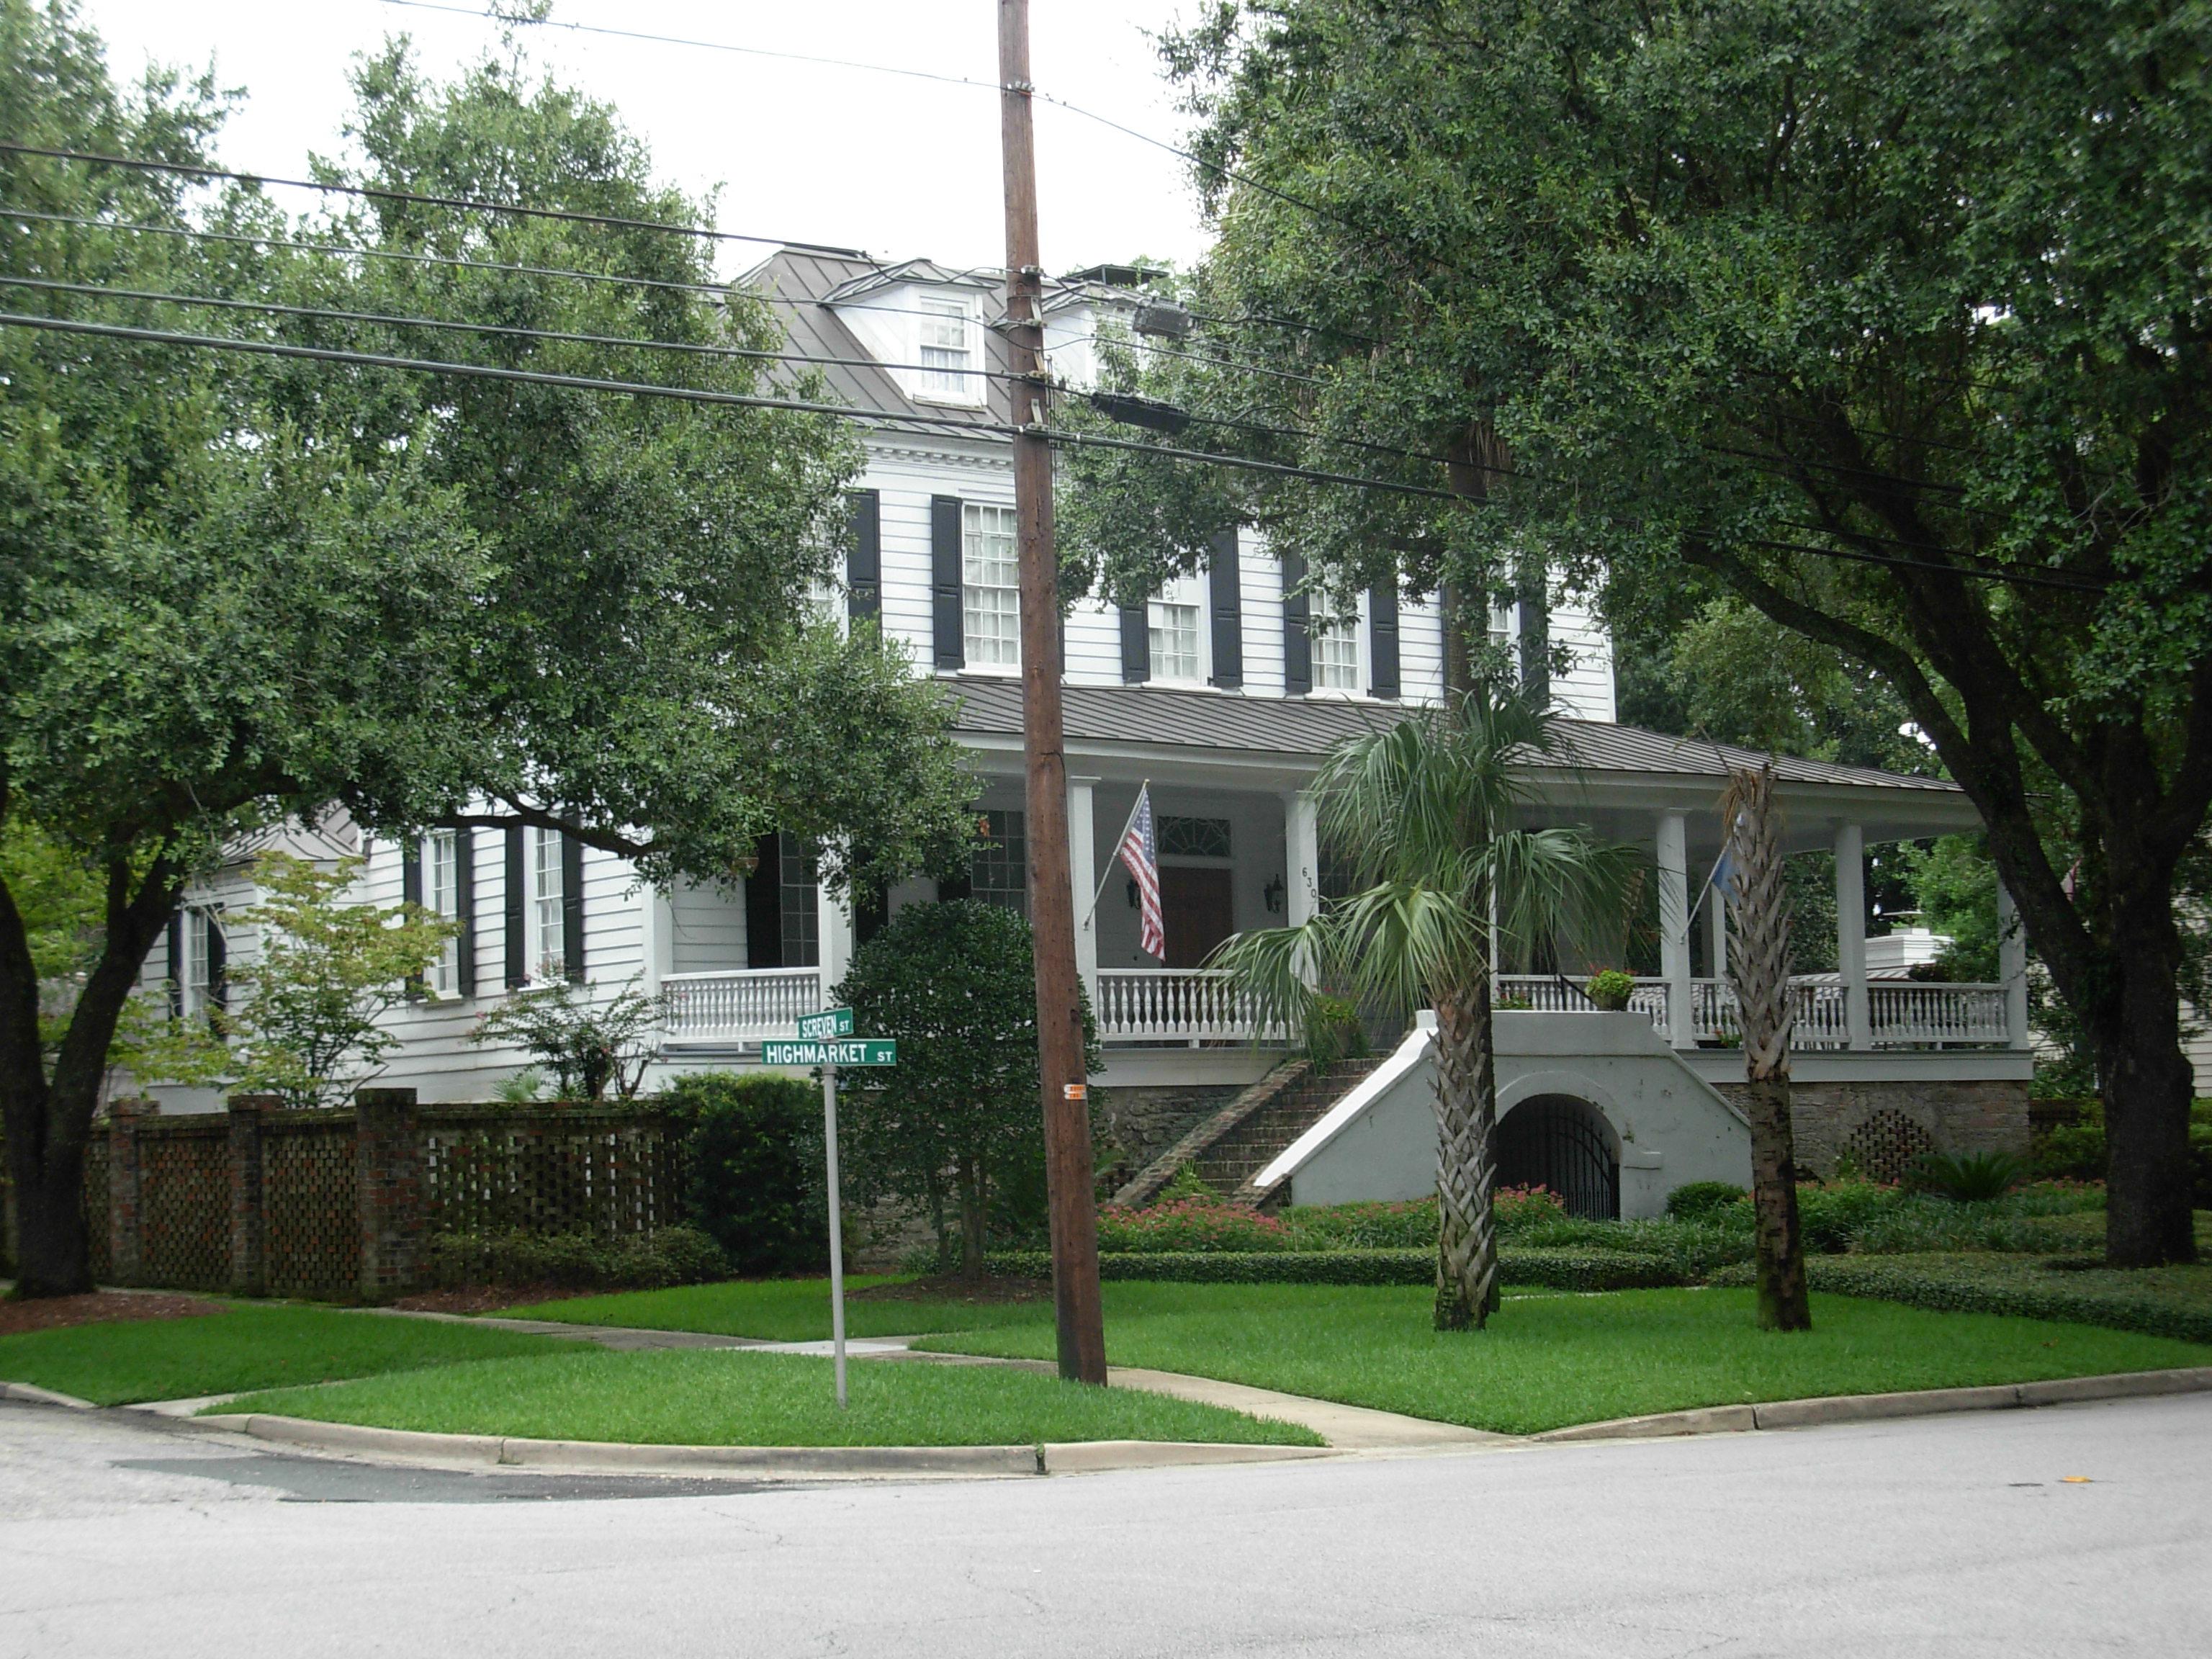 Pyatt-Doyle House Georgetown South Carolina ghosts haunted